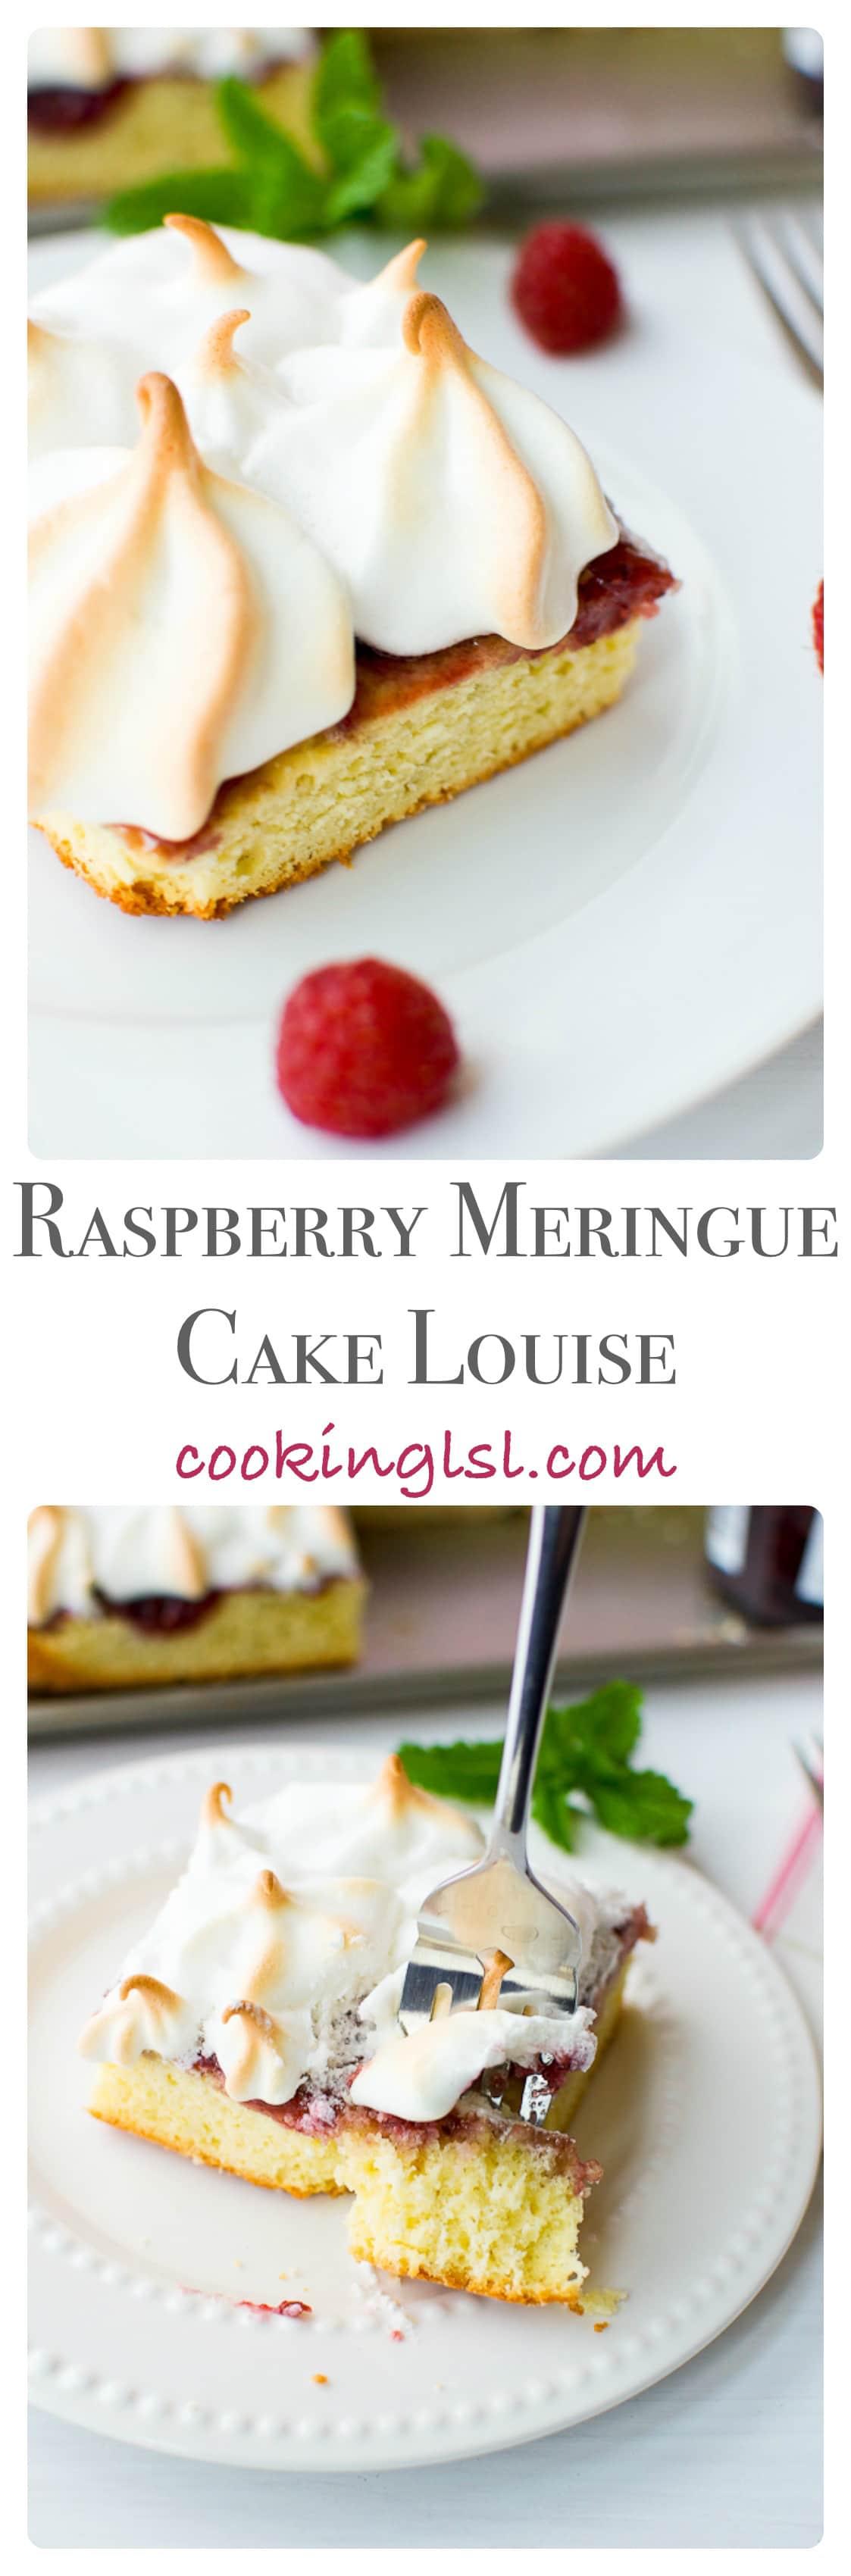 RASPBERRY-JAM-AND-MERINGUE-CAKE-LOUISE-LADIES-CAPRICE